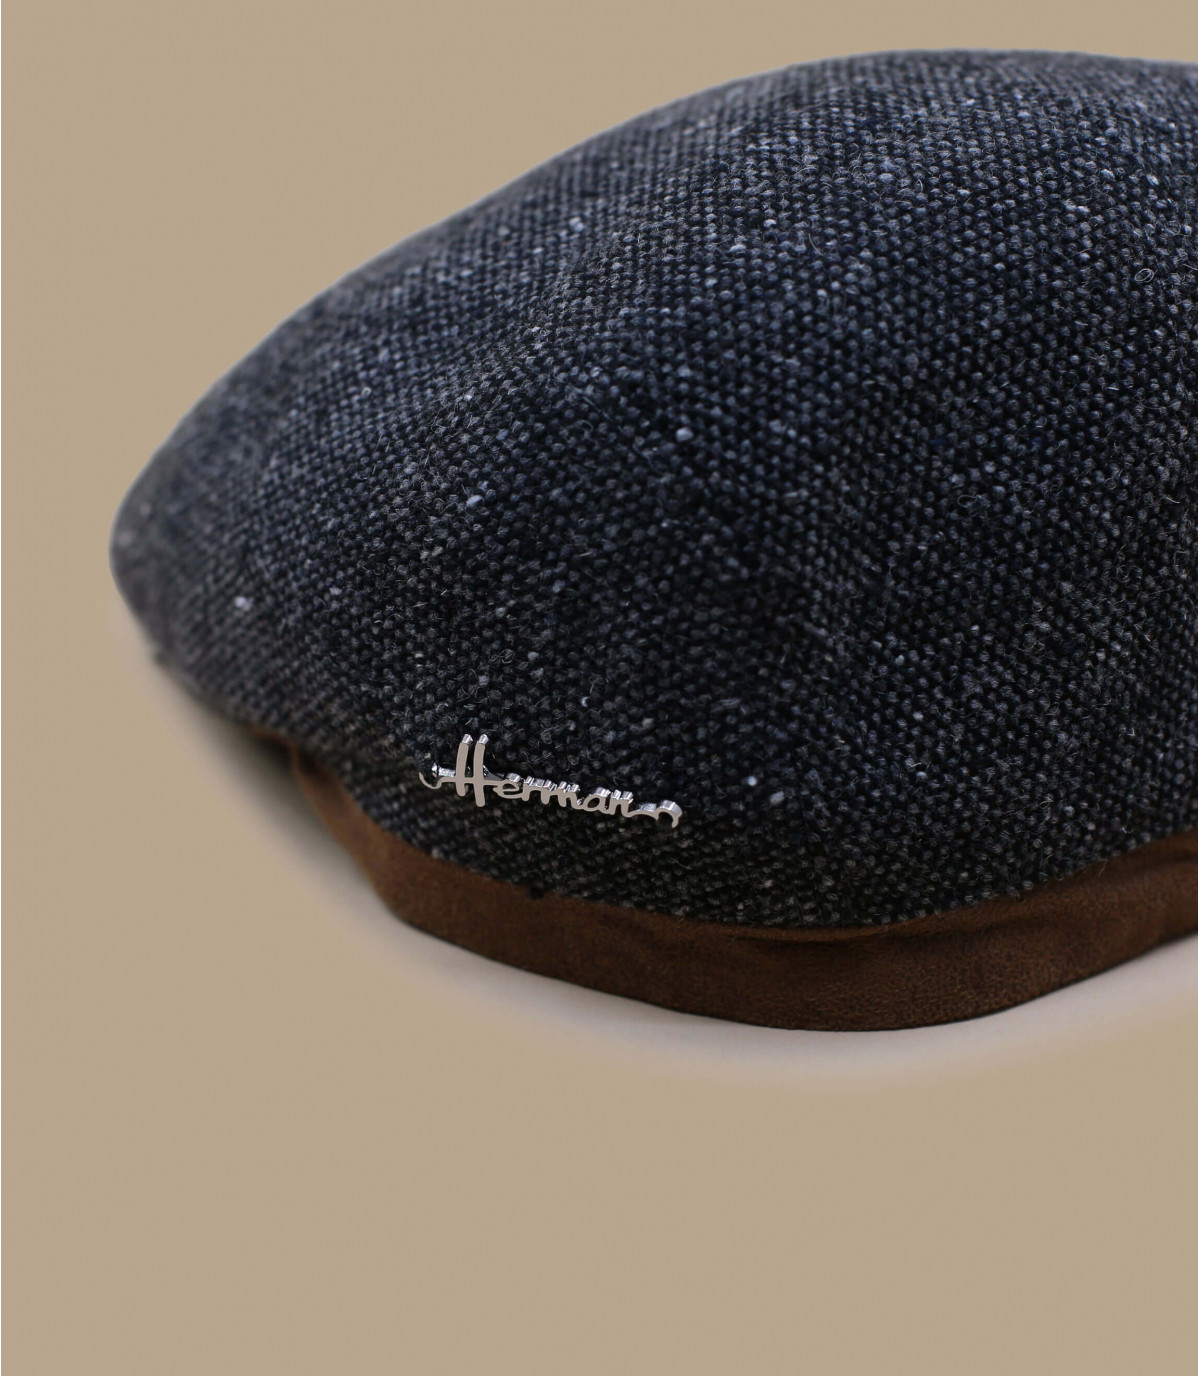 Details Range Wool charcoal - Abbildung 2